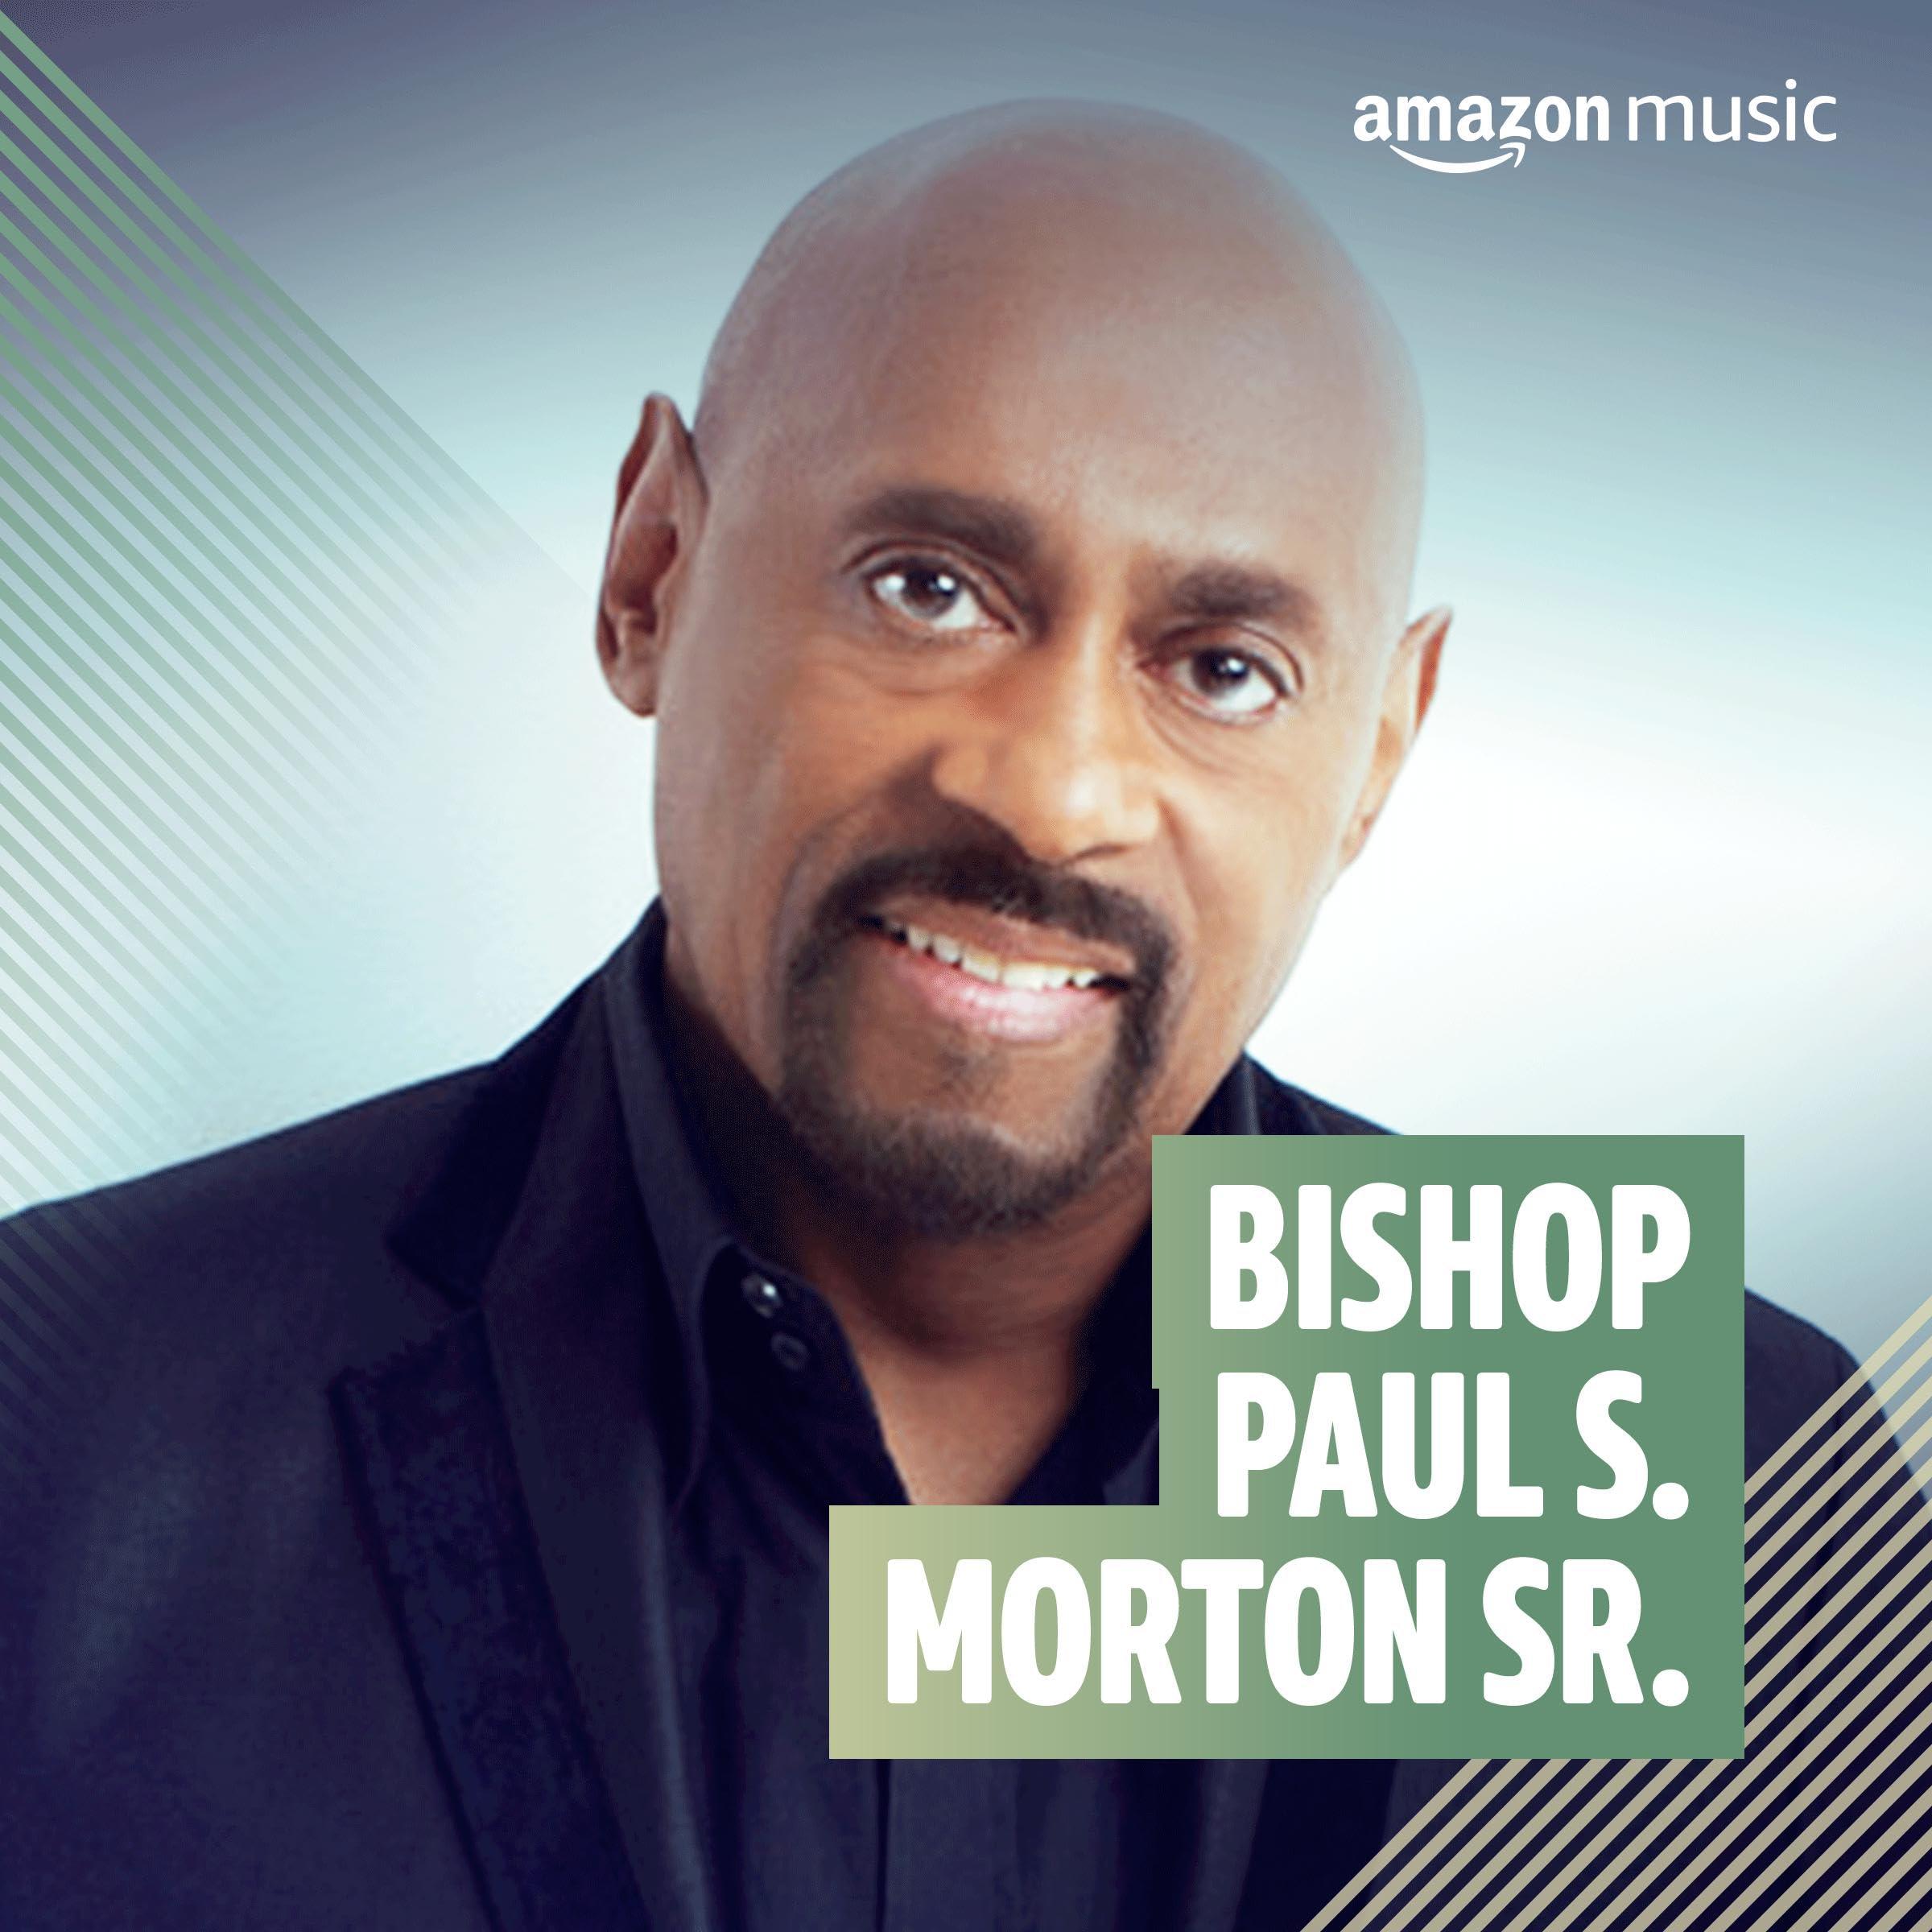 Bishop Paul S. Morton Sr.